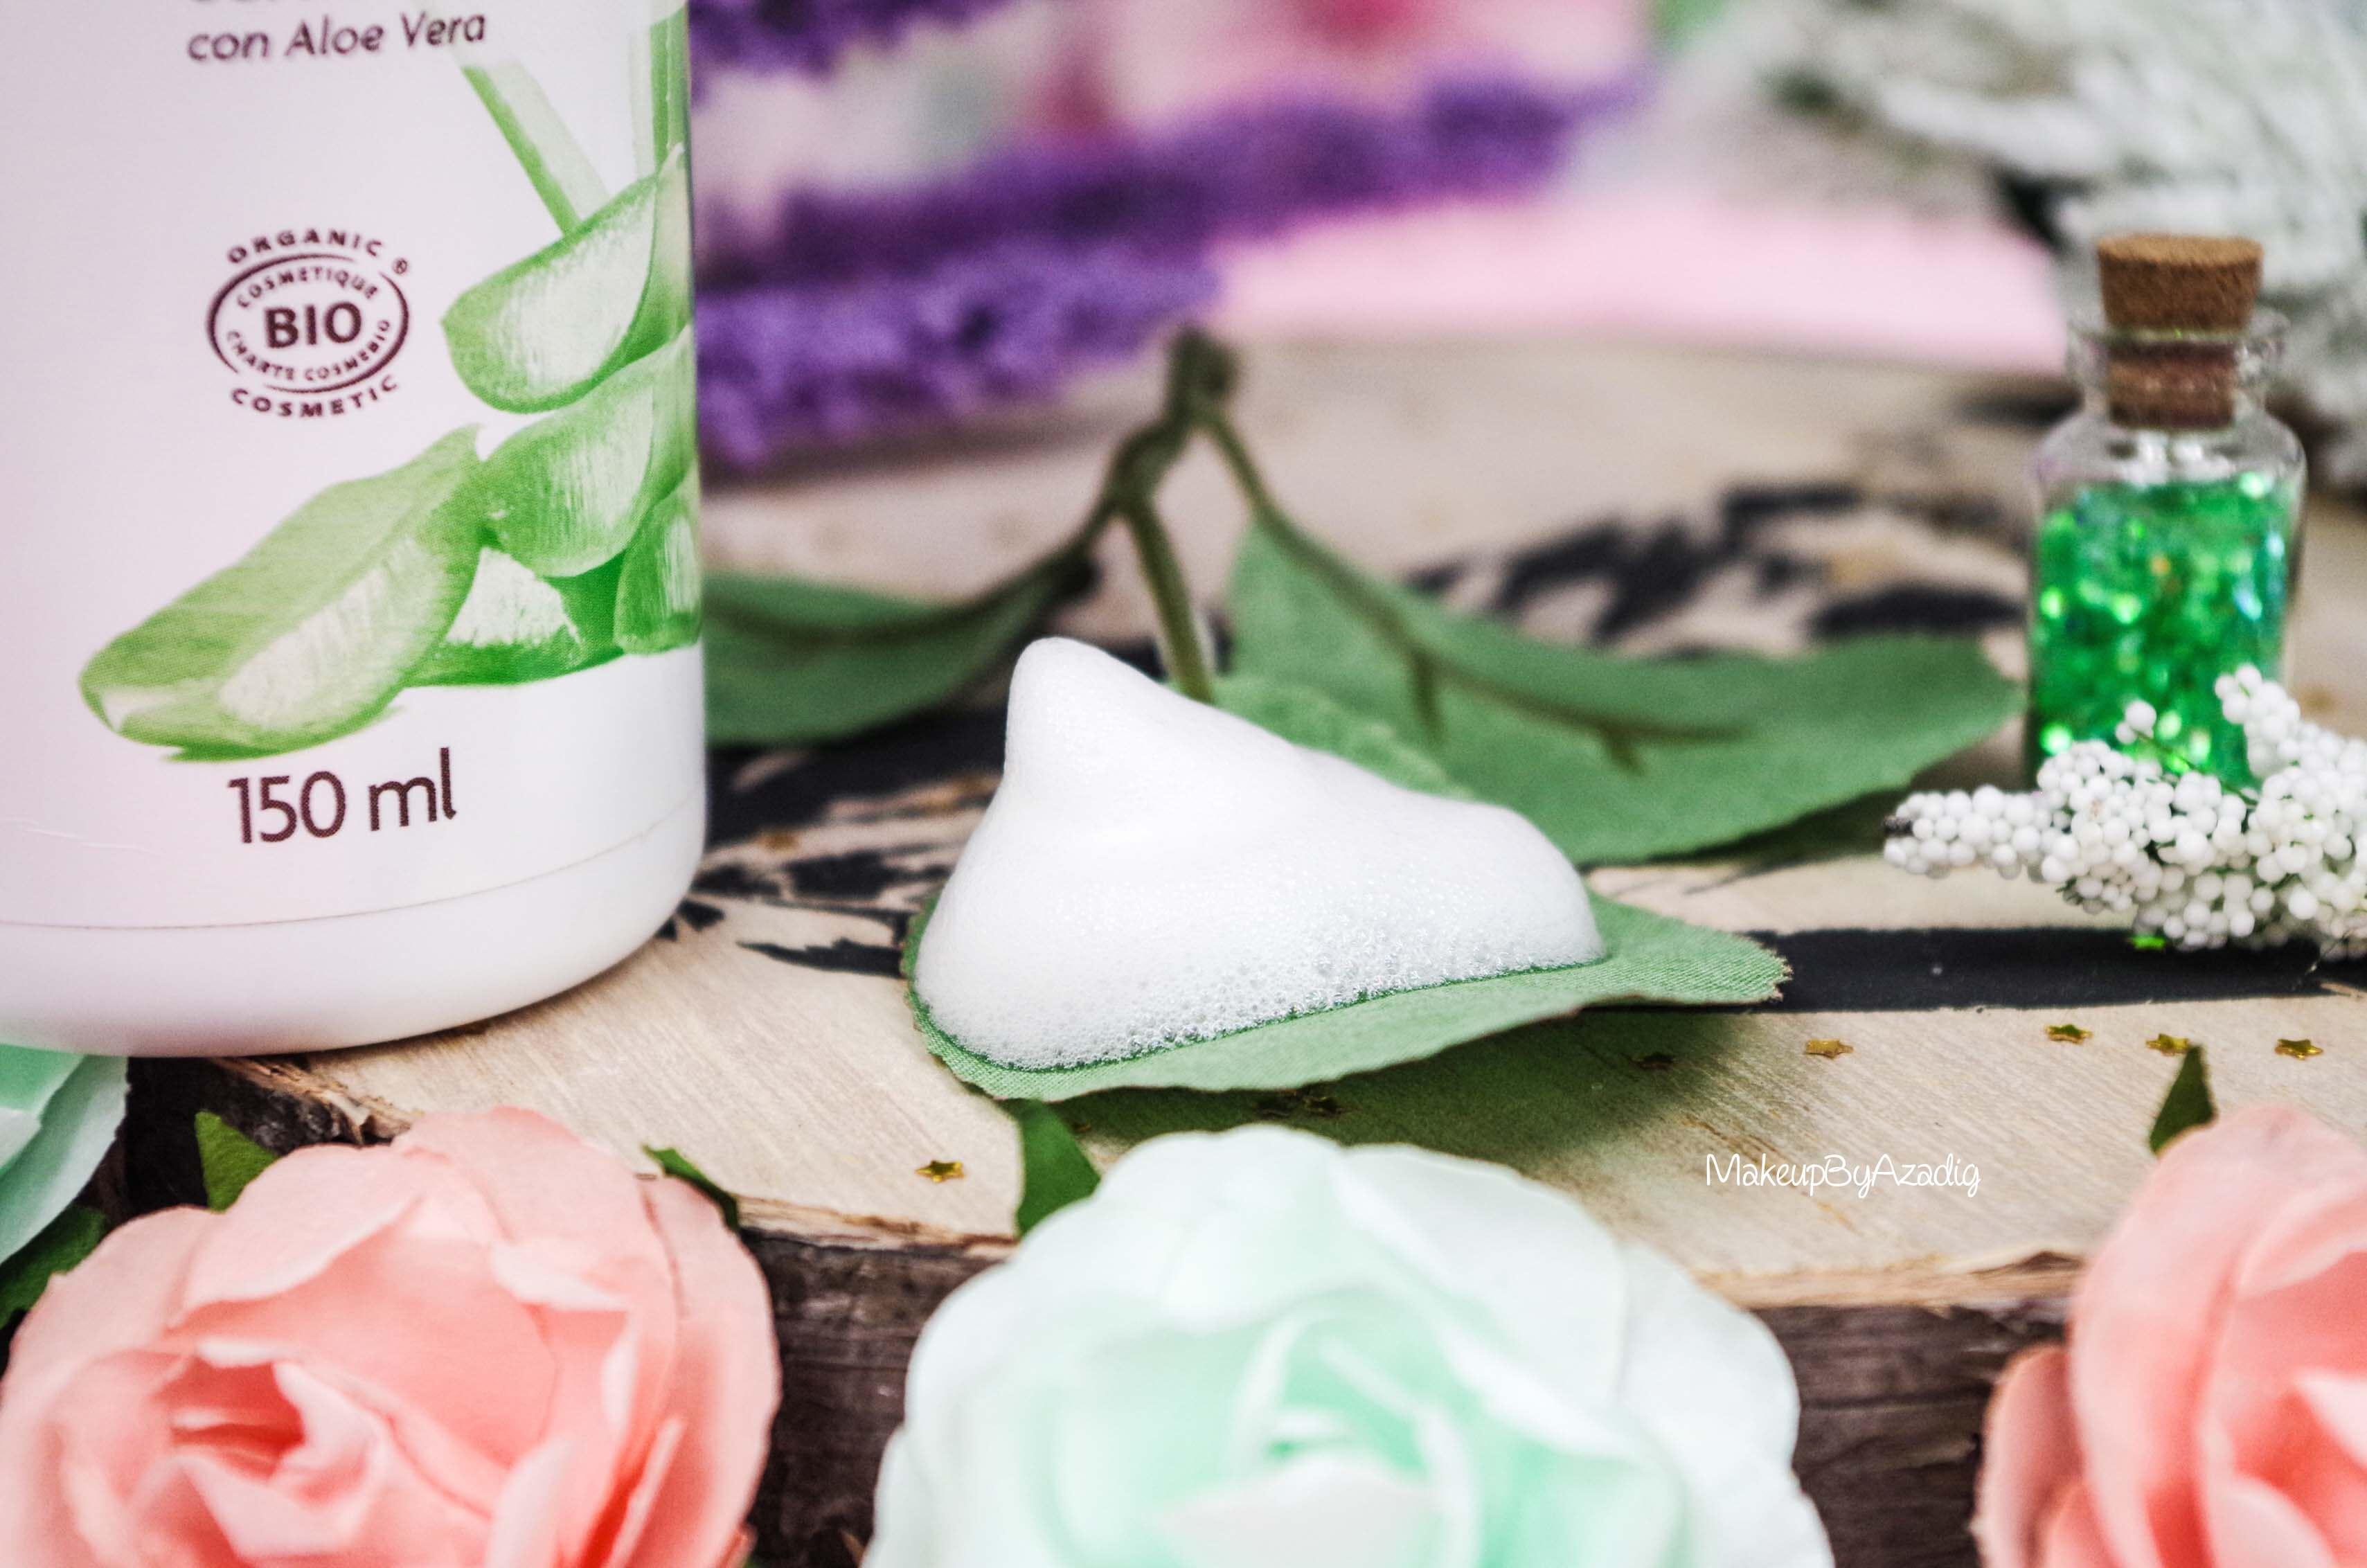 texture-revue-review-mousse-nettoyante-douce-fleurance-nature-partenariat-soin-bio-makeupbyazadig-avis-prix-influencer